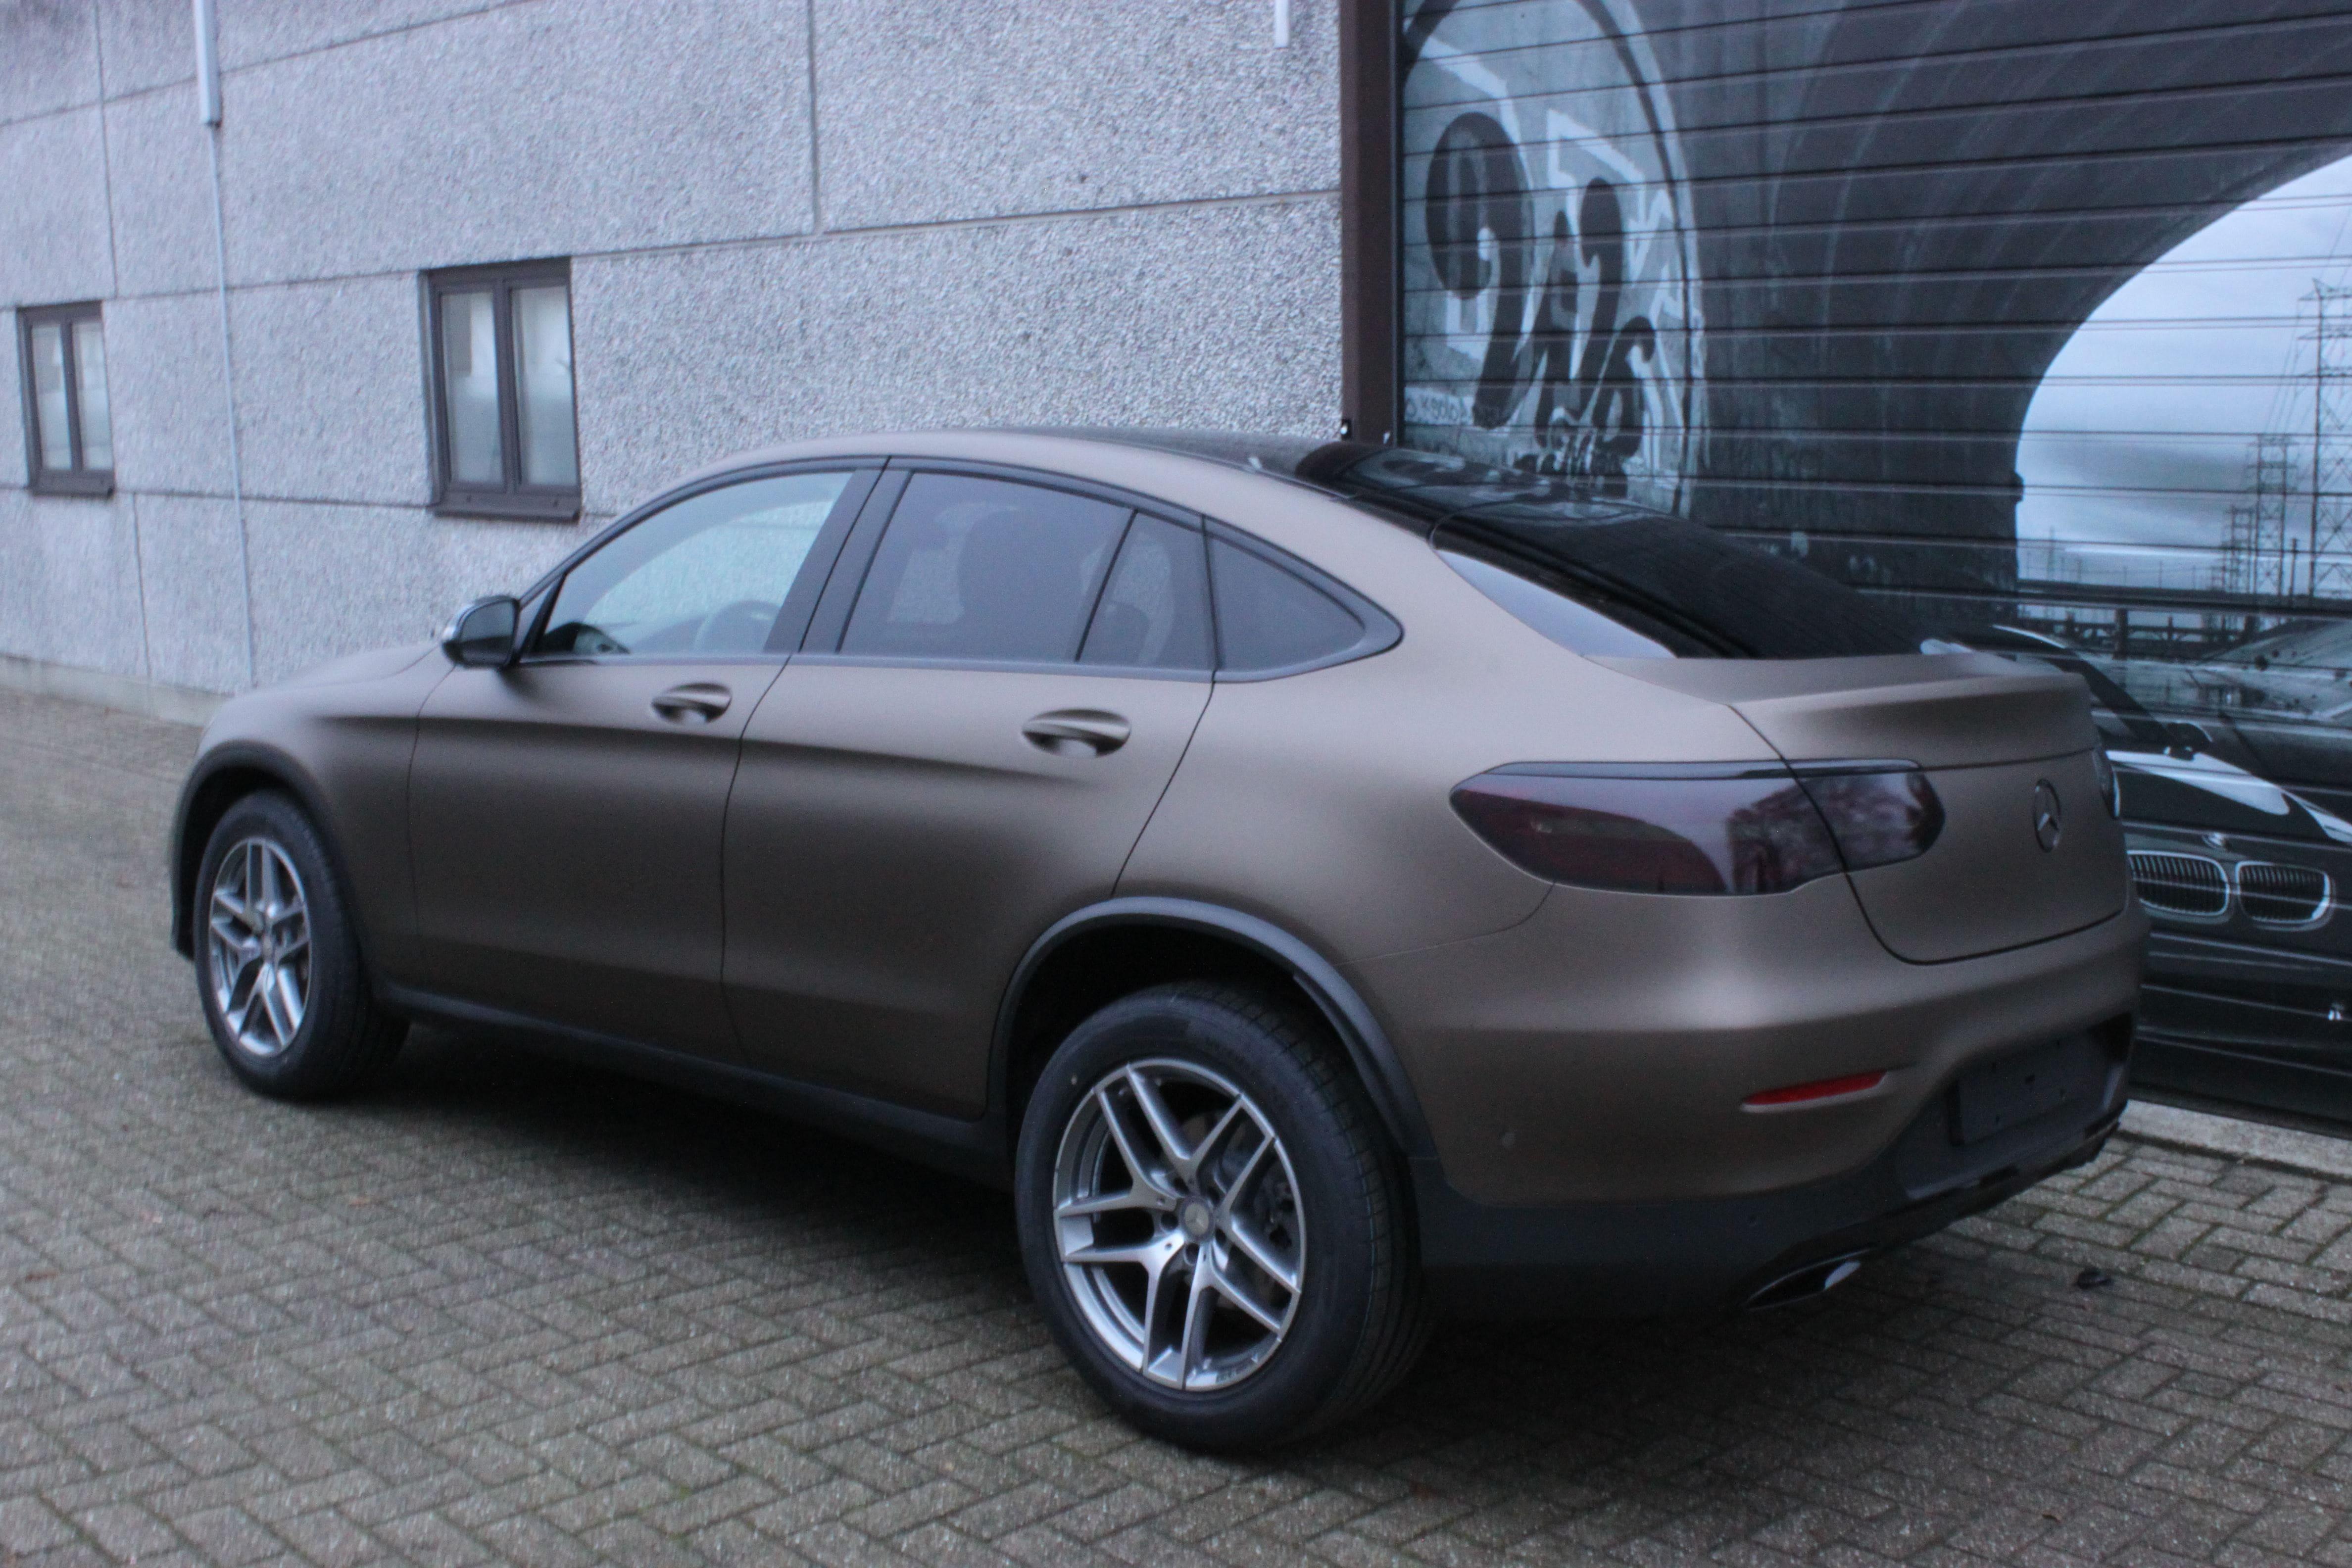 Mercedes GLC Coupe Matte metallic brown, Carwrapping door Wrapmyride.nu Foto-nr:9364, ©2021